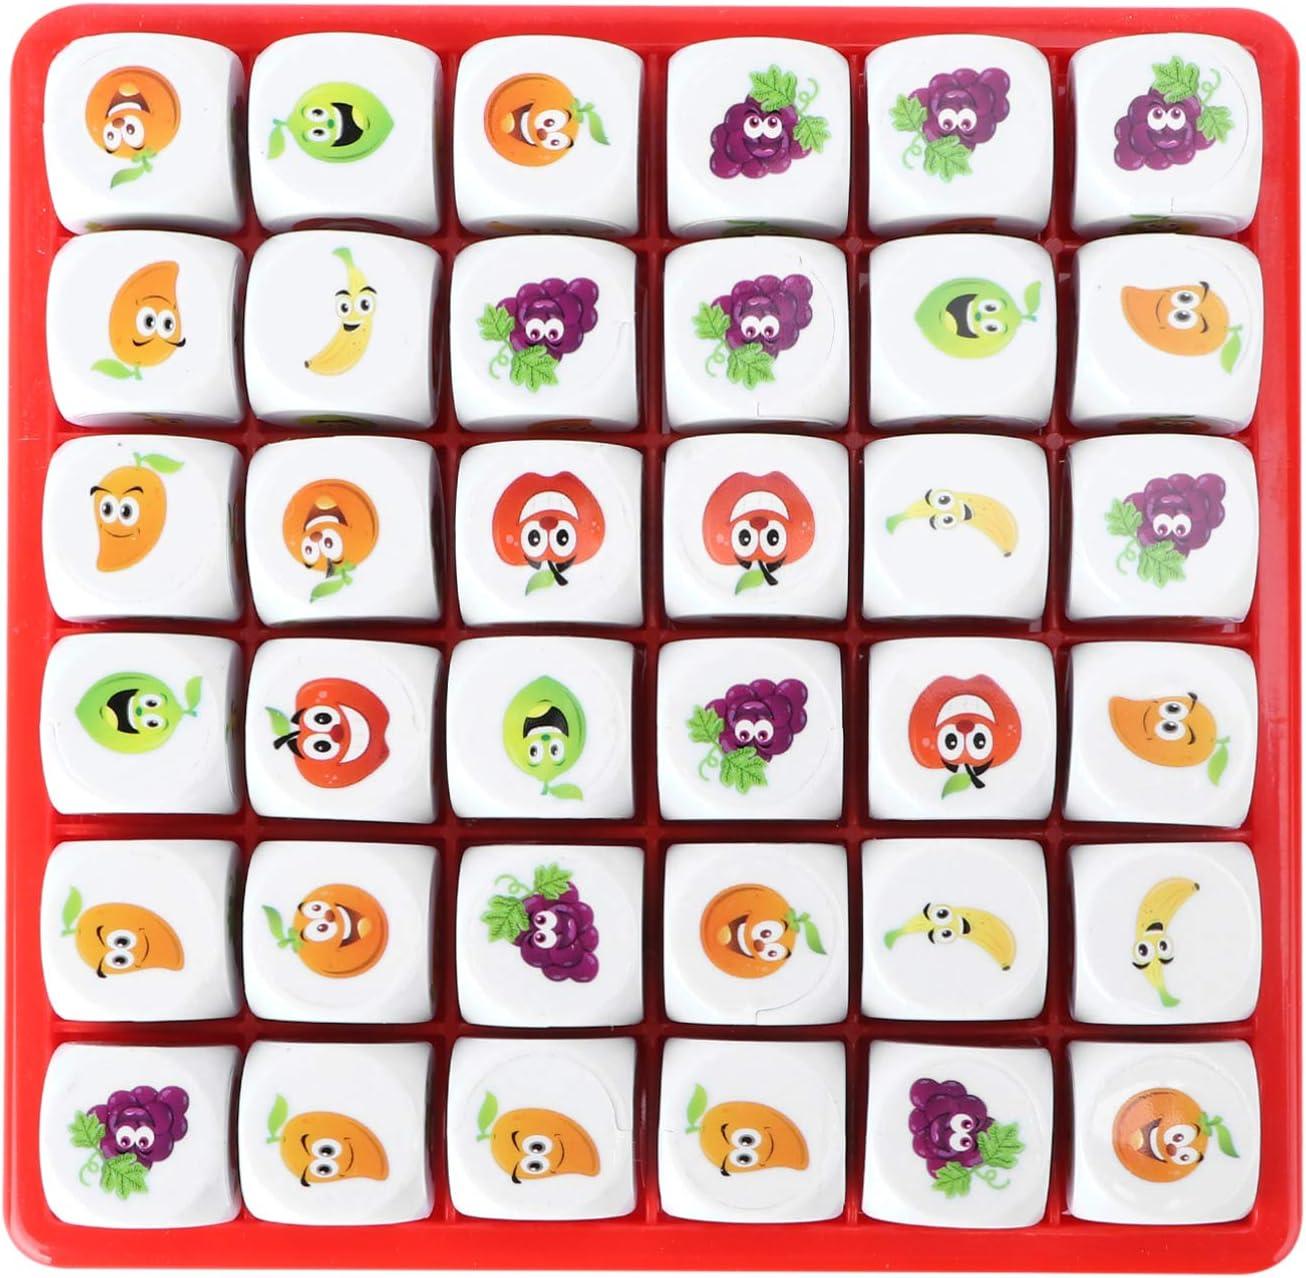 jojofuny Animer Factory outlet and price revision Fruit Sudoku Puzzle Game Board Logic Toy Educati